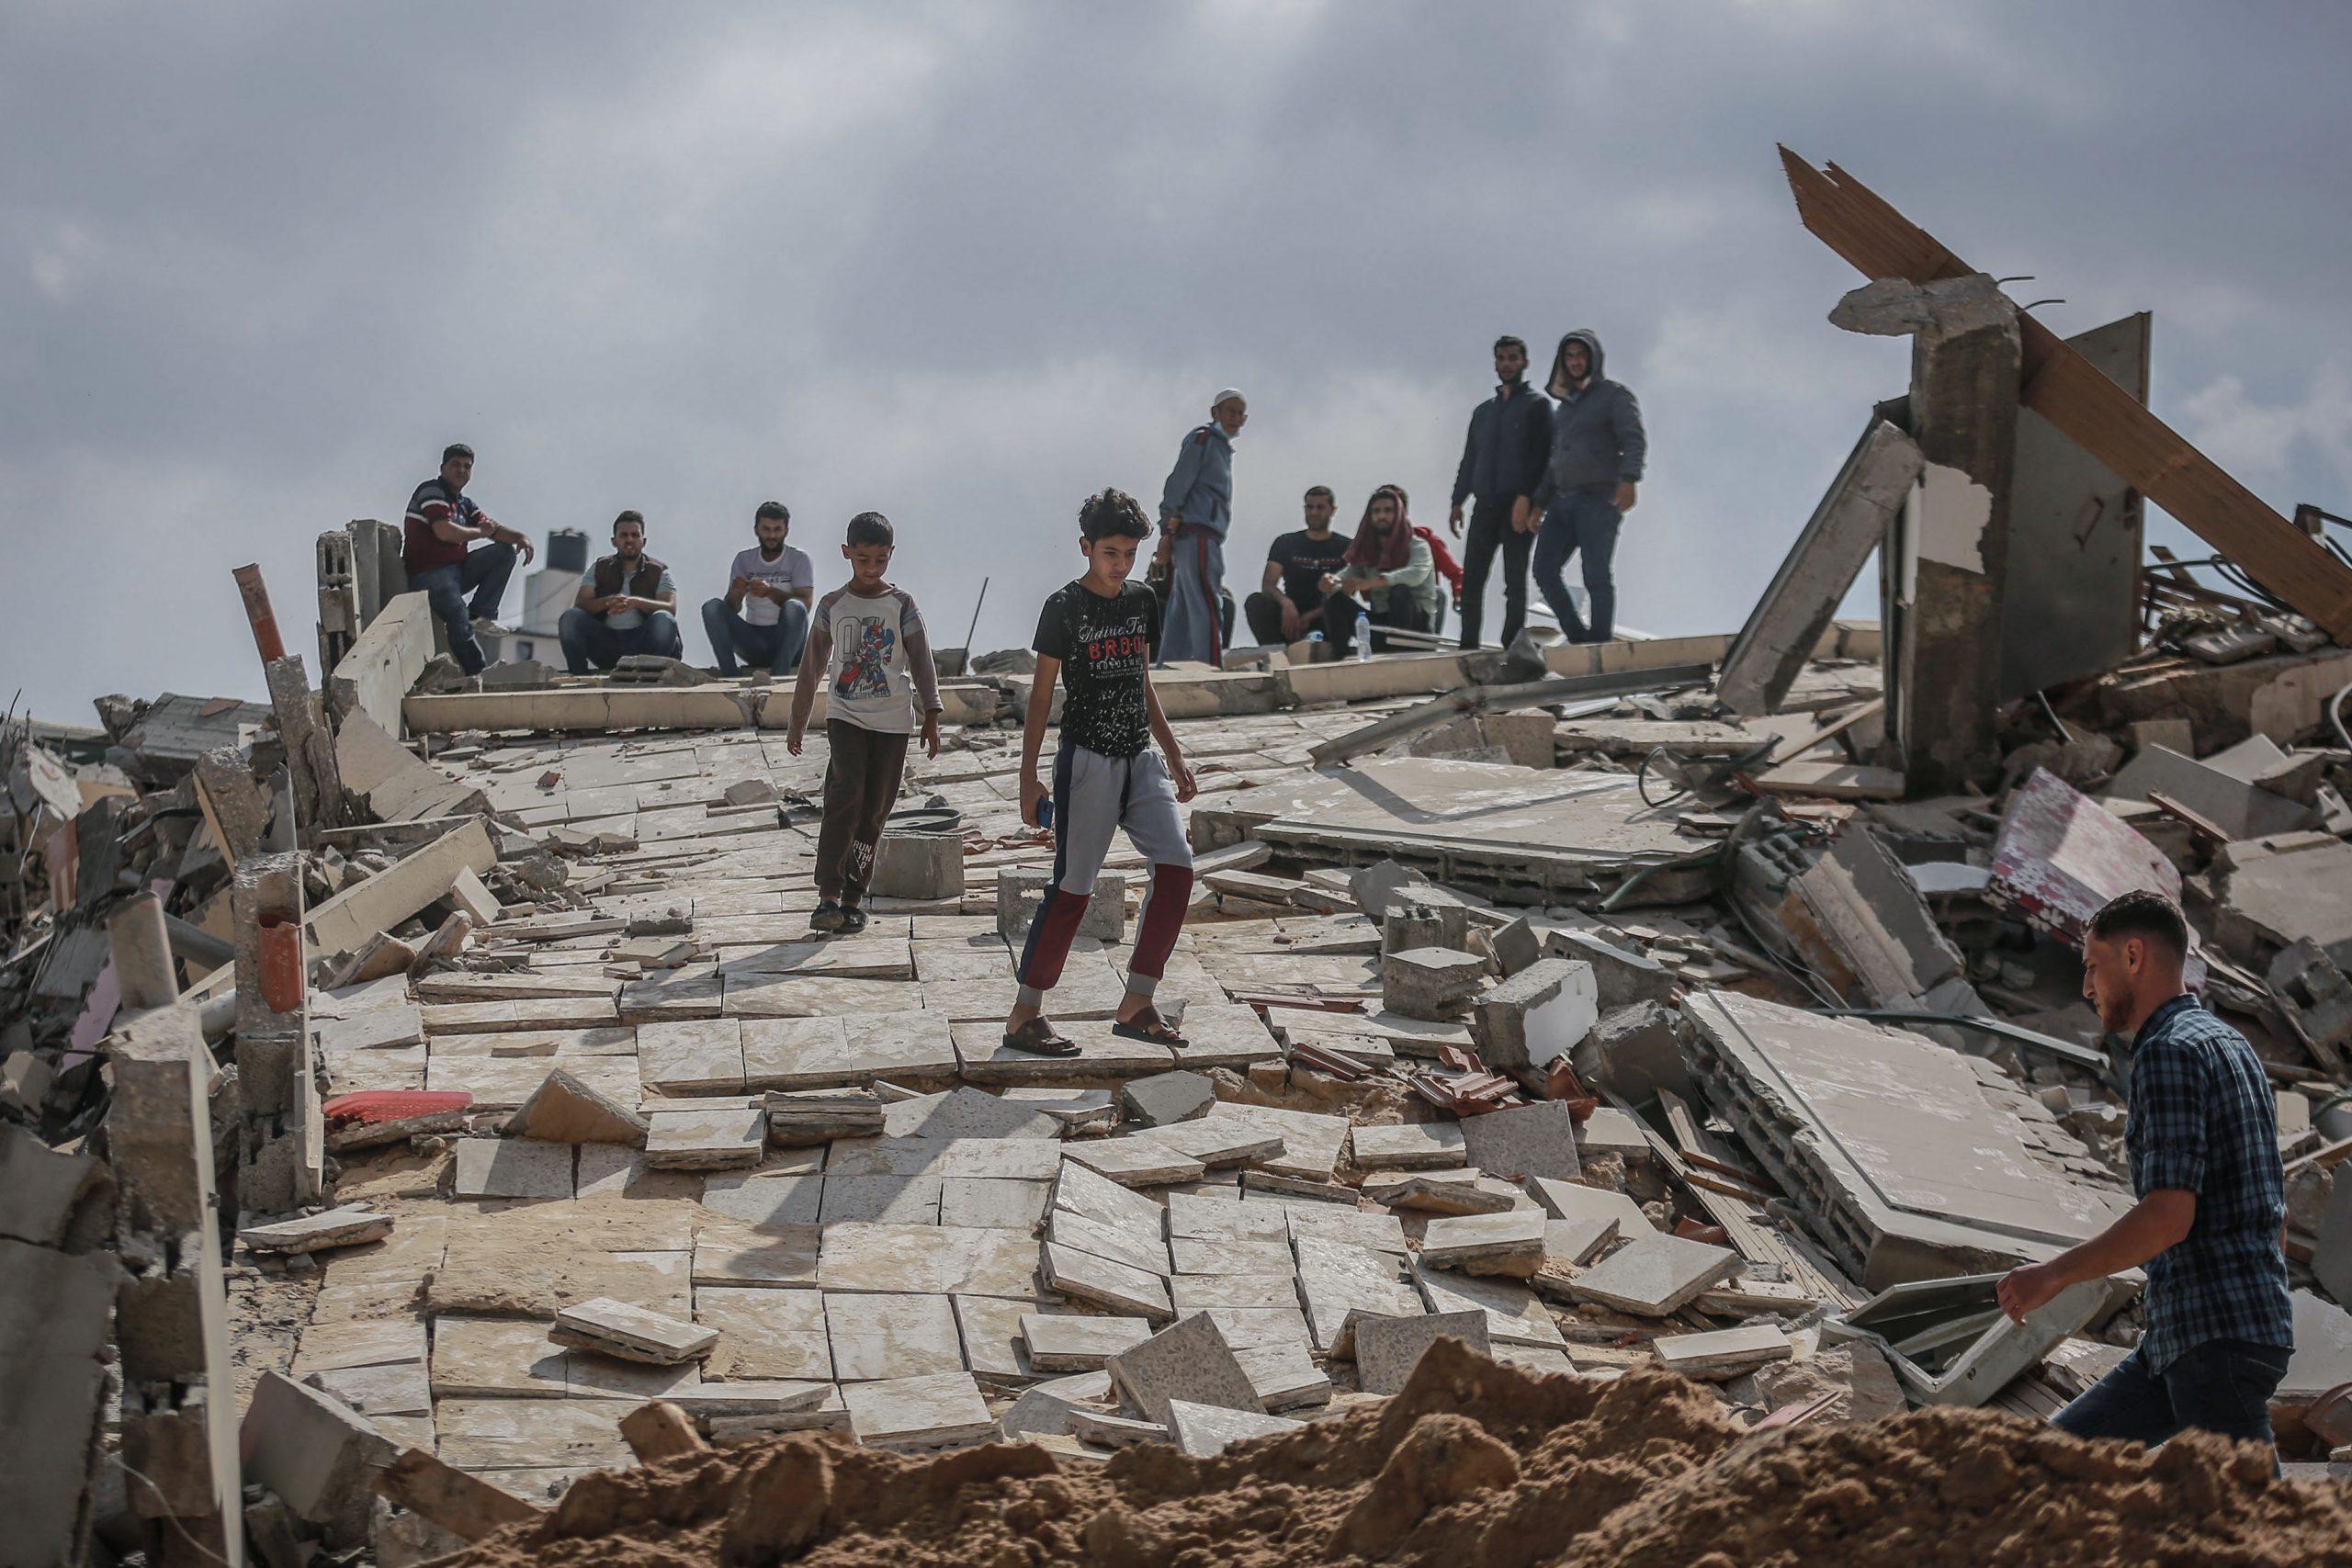 Palestins inspeccionant una zona bombardejada per Israel a Gaza /Foto: Mohammed Talatene/dpa/Europa Press